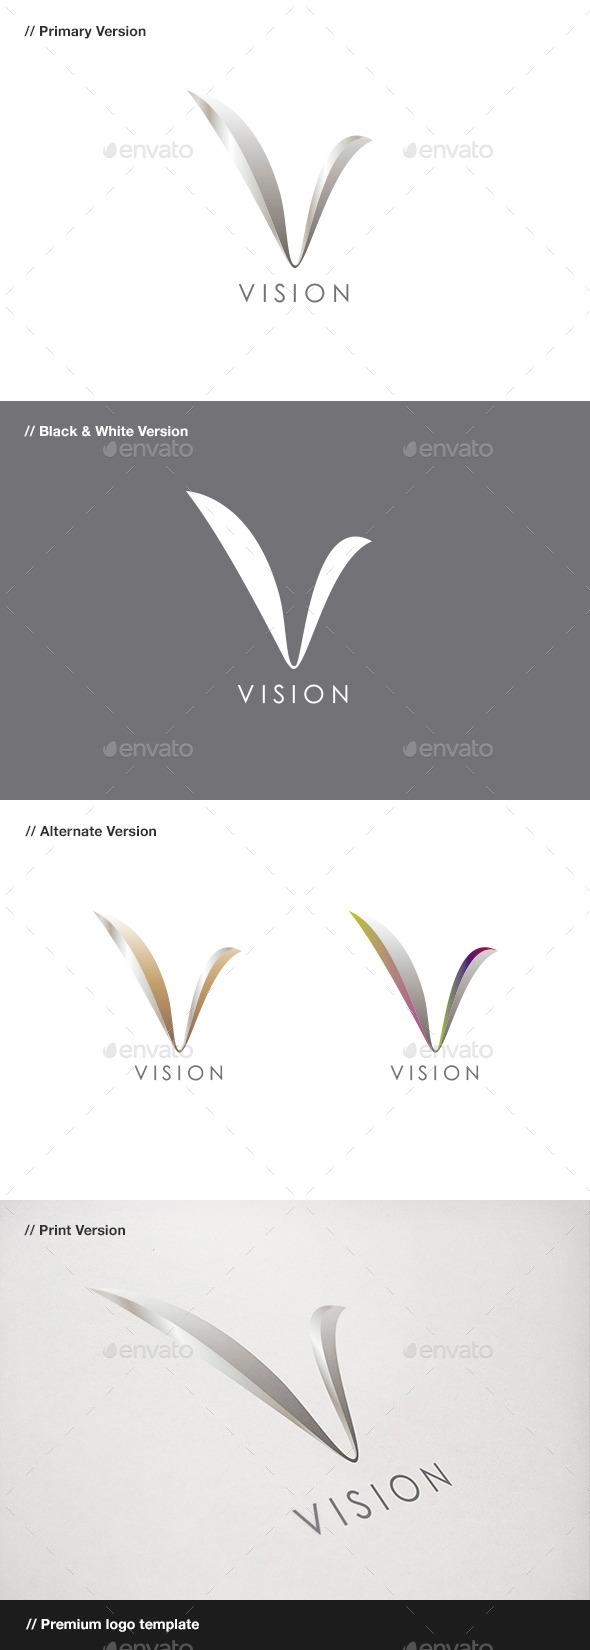 Vision - Abstract & Letter V Logo